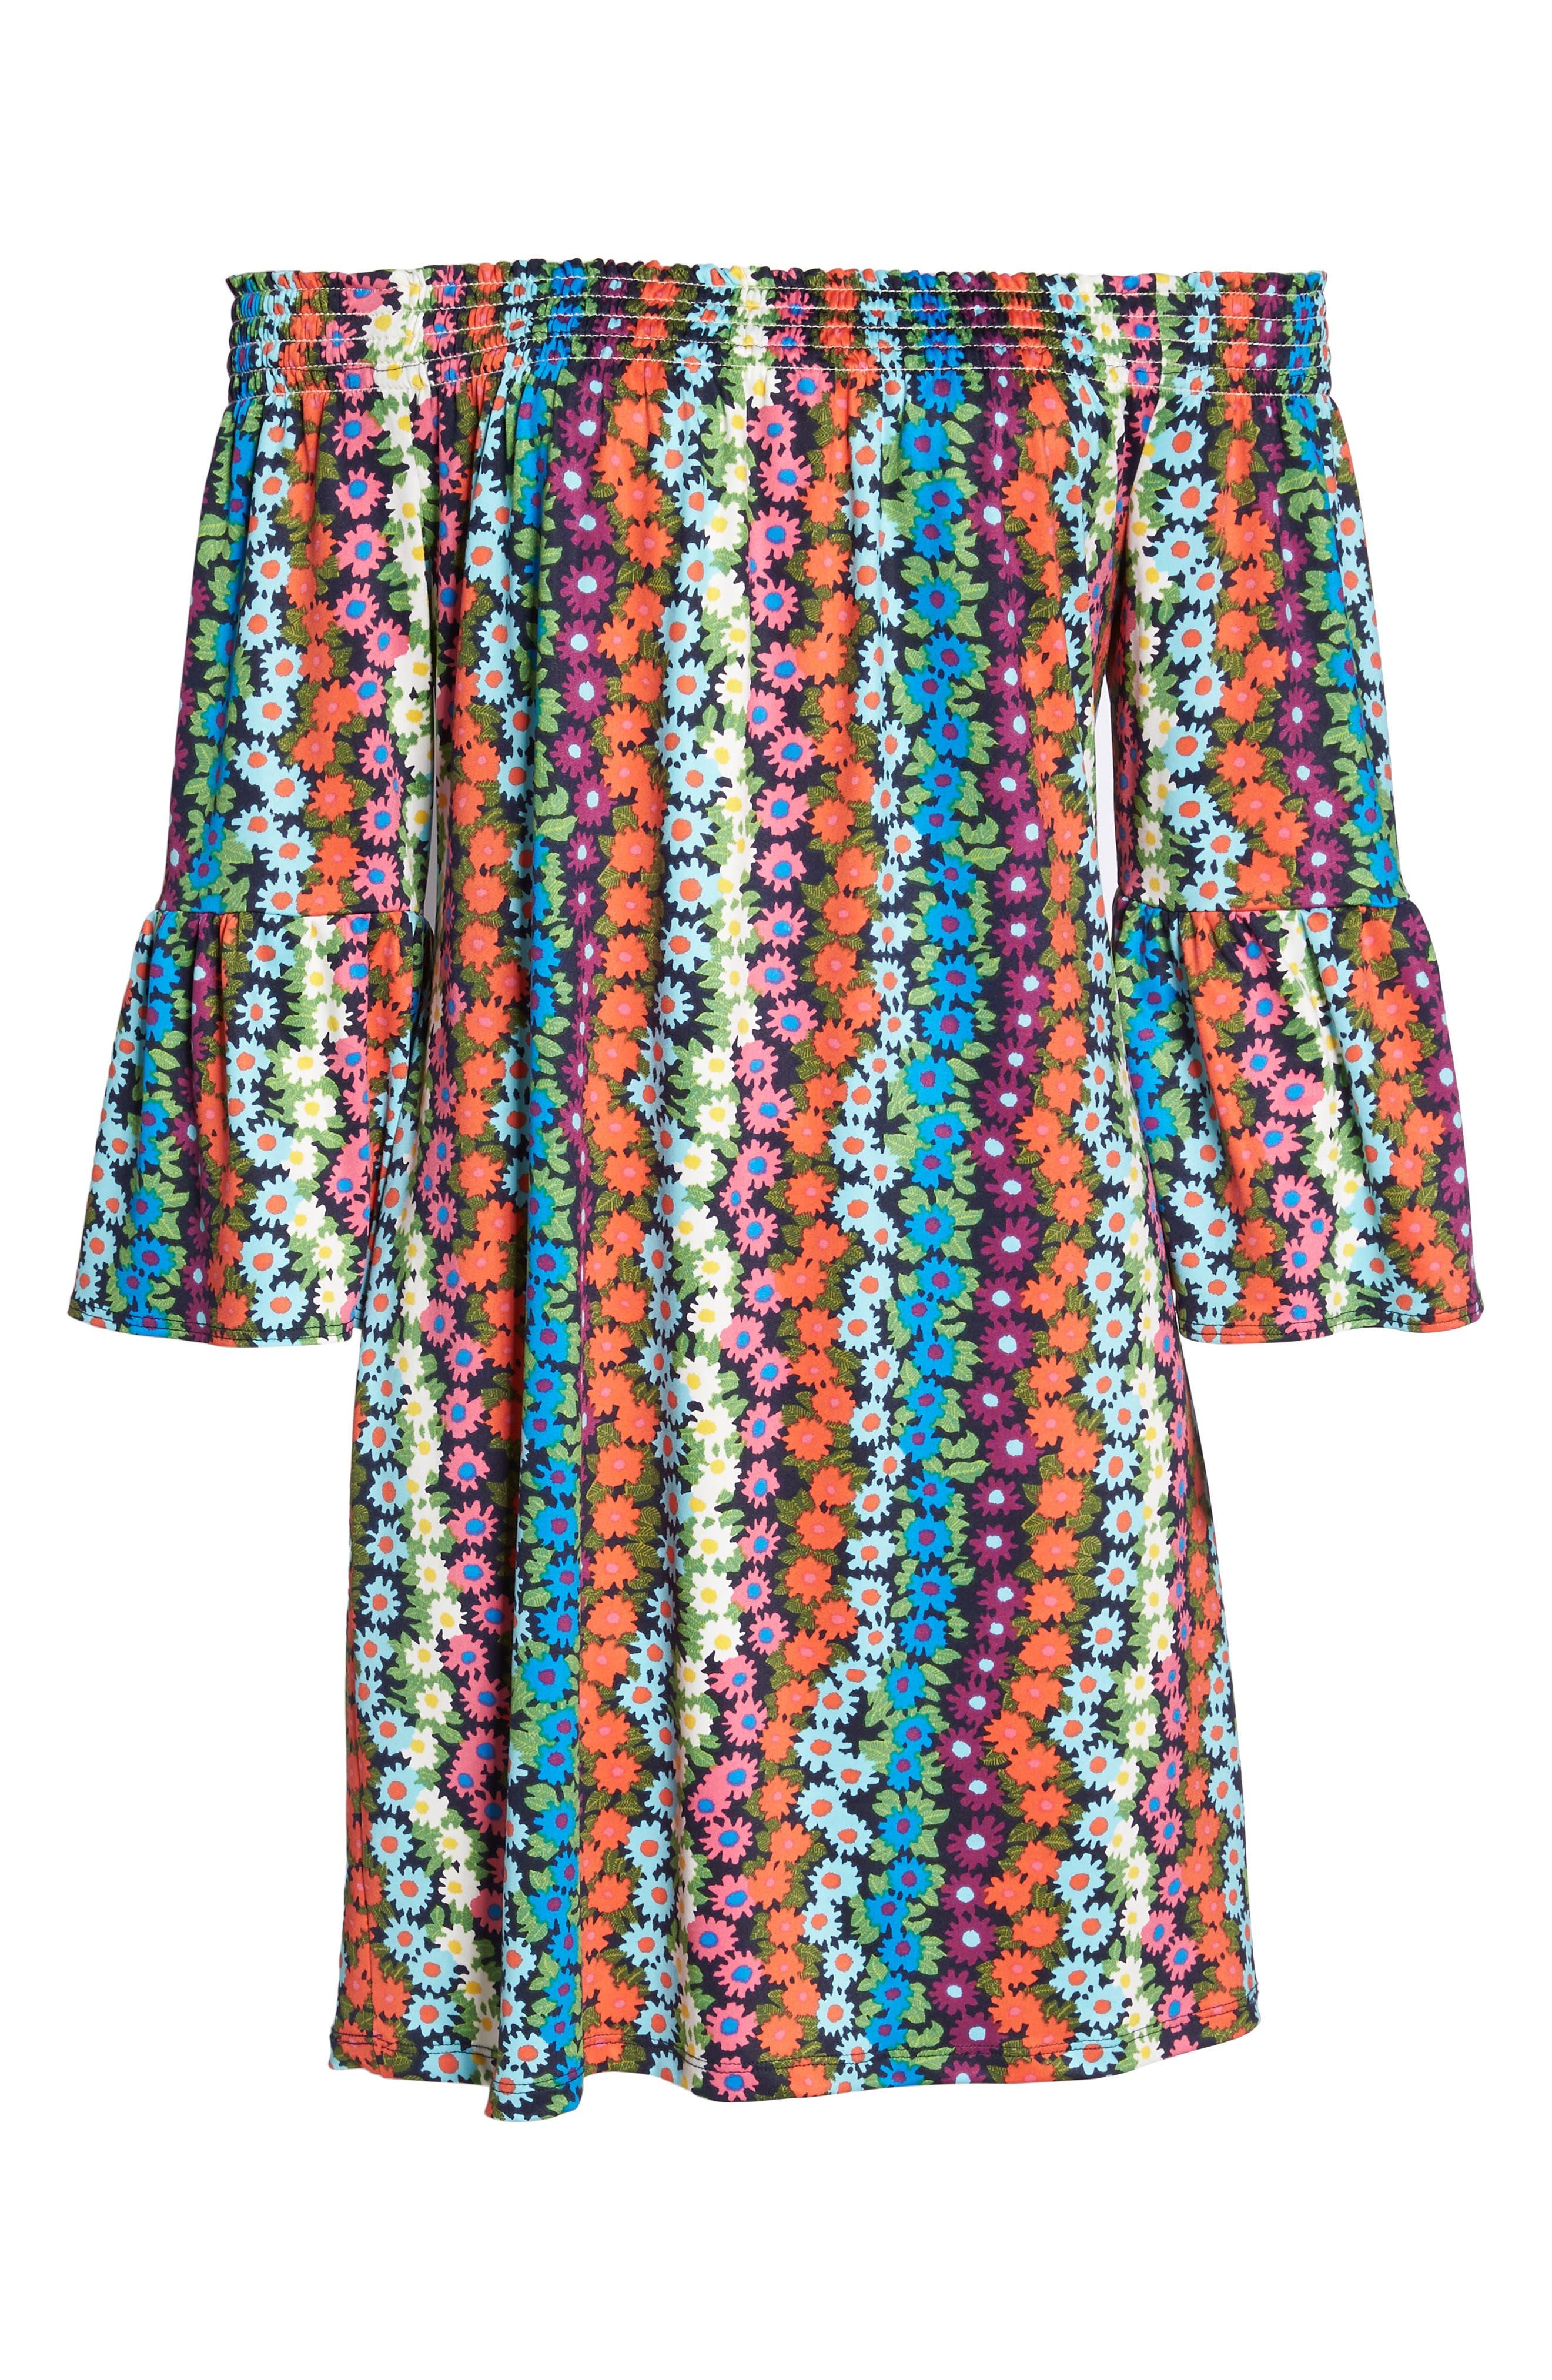 Trina Turk Off the Shoulder Bell Sleeve Dress,                             Alternate thumbnail 6, color,                             460